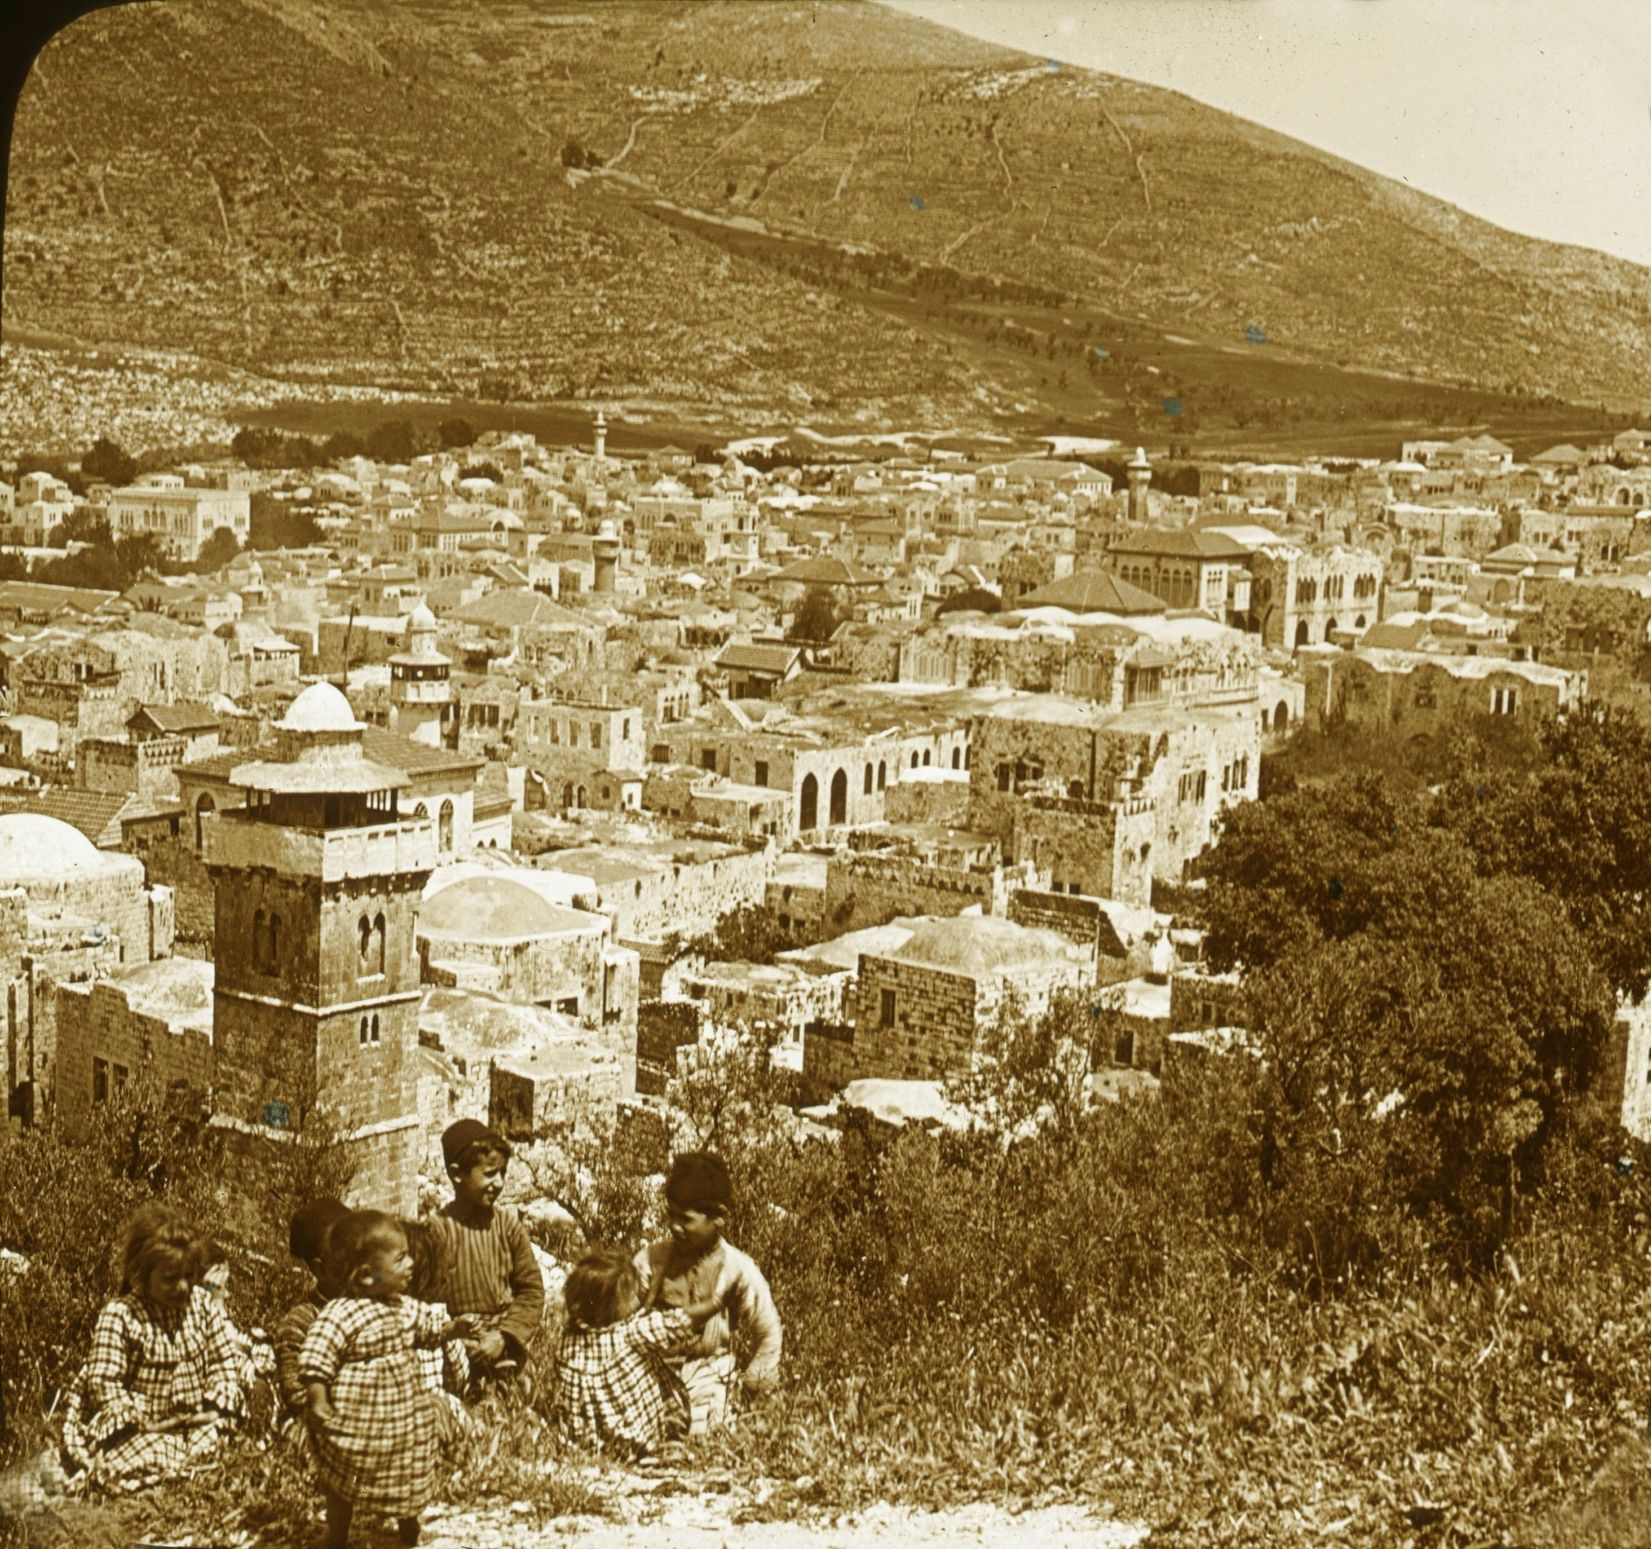 Nablus-نابلس: NABLUS - Late 19th, early 20th c. 40 - Nablus and Mount Ebal, 1880s